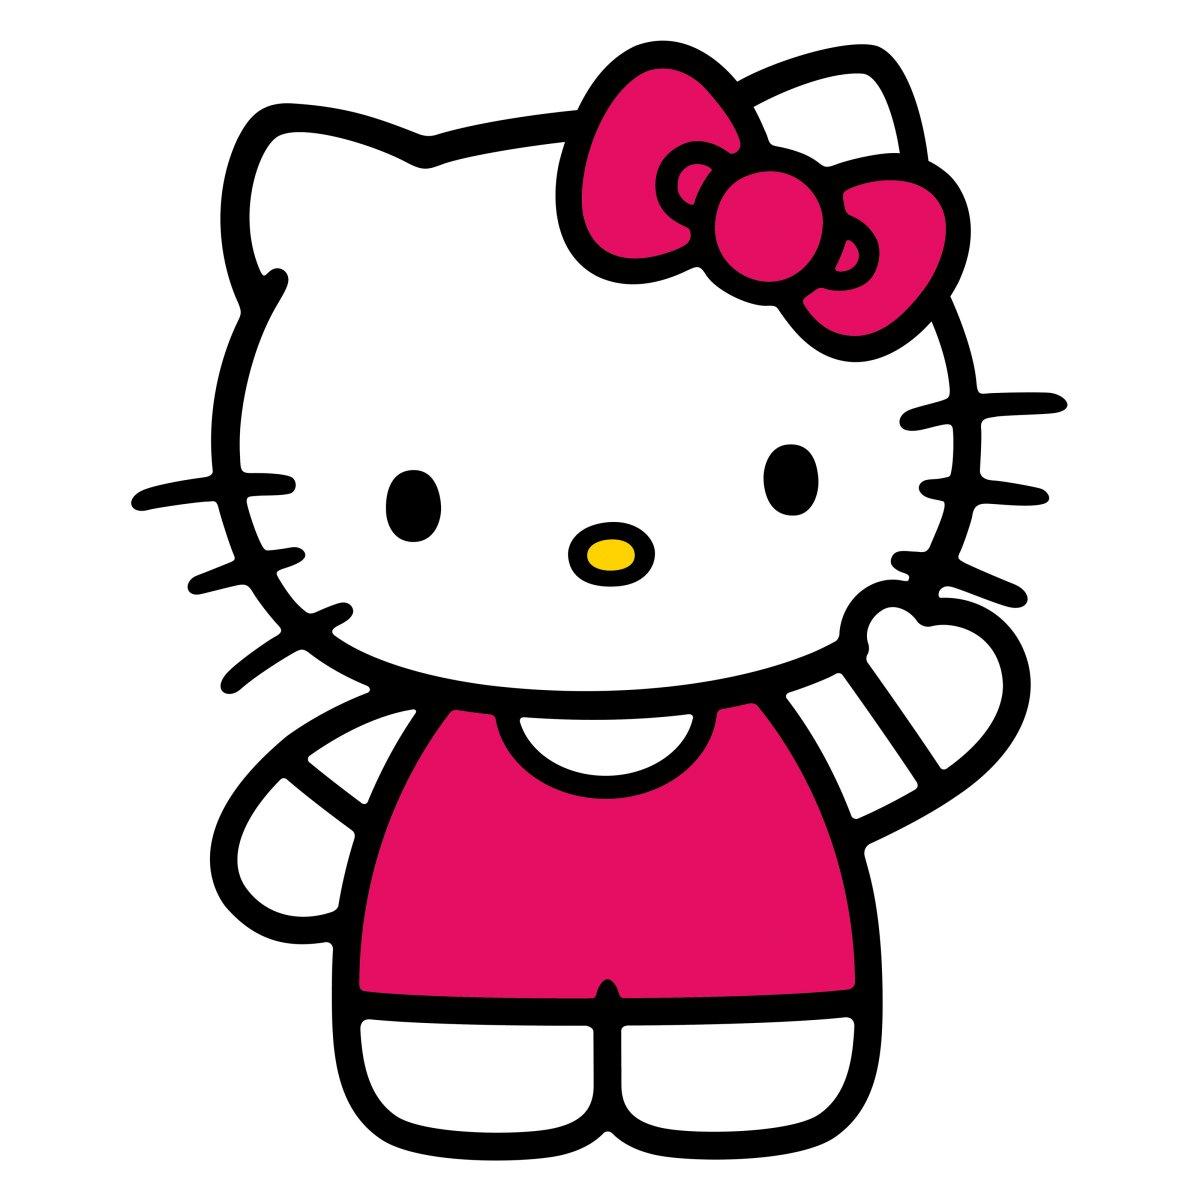 clipart hello kitty birthday - photo #13